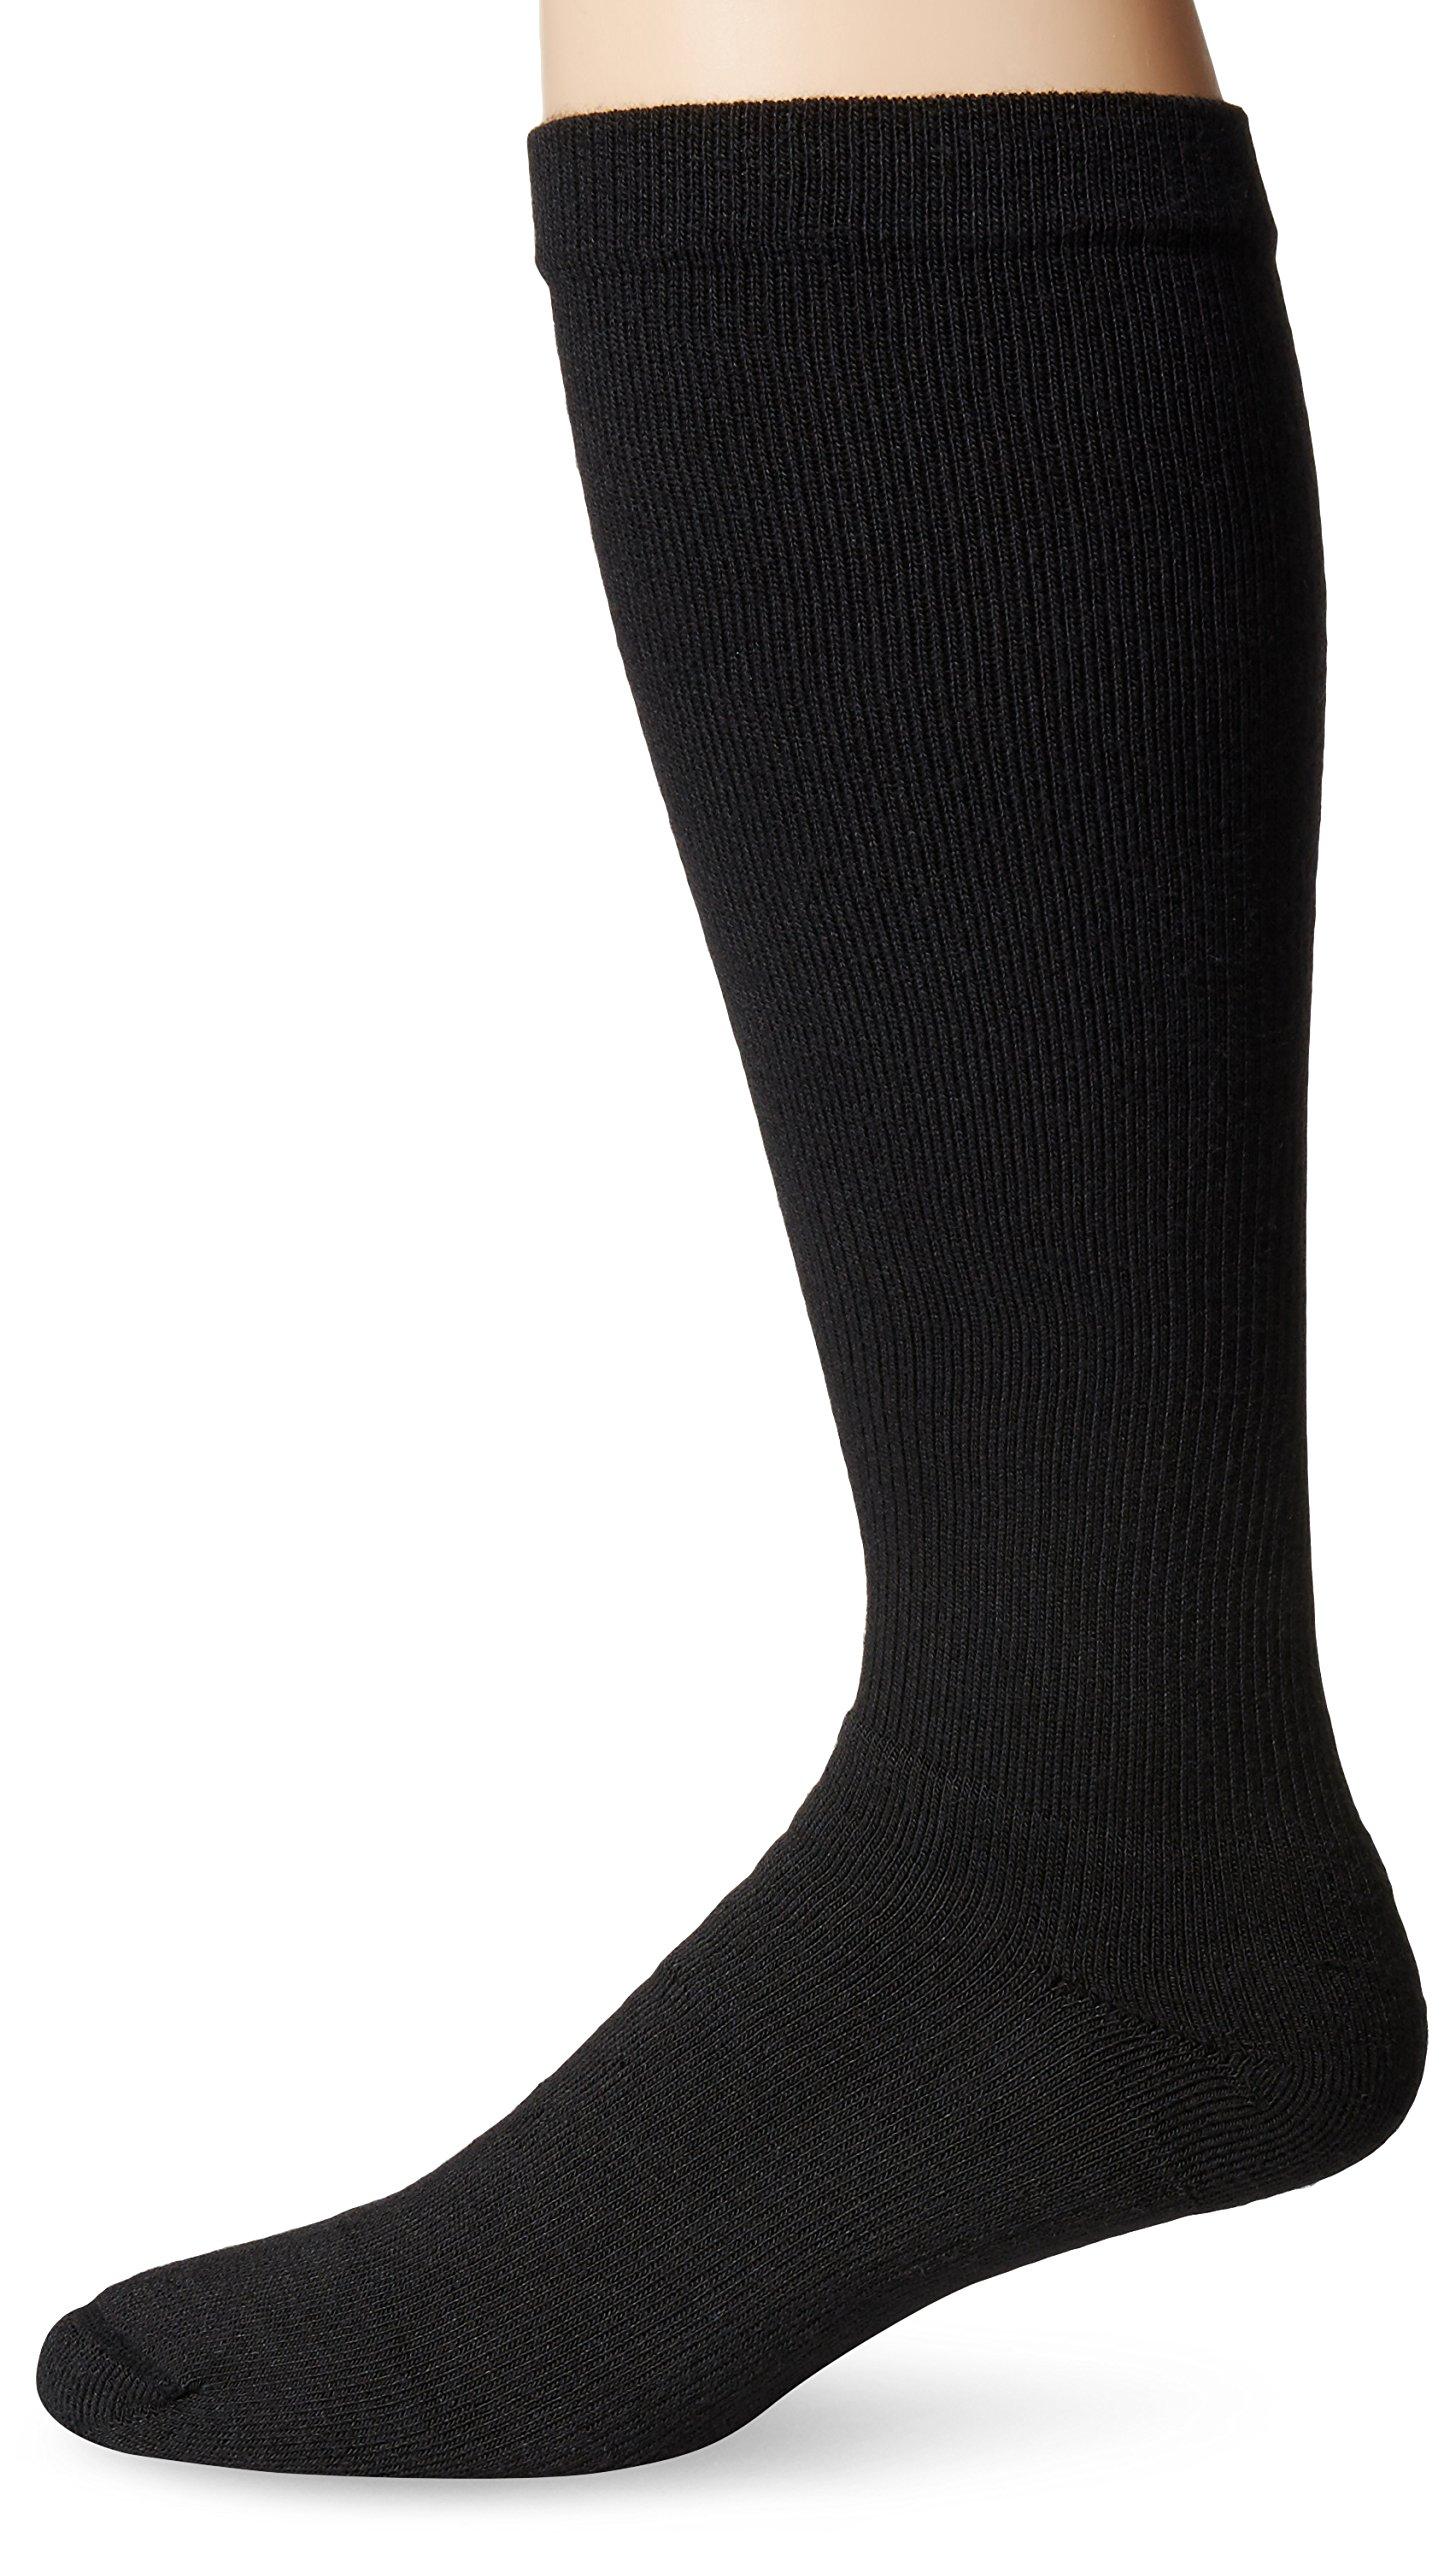 Dr. Scholl's Men's Coolmax Firm Support Socks,  Black, Shoe: 7.5-10